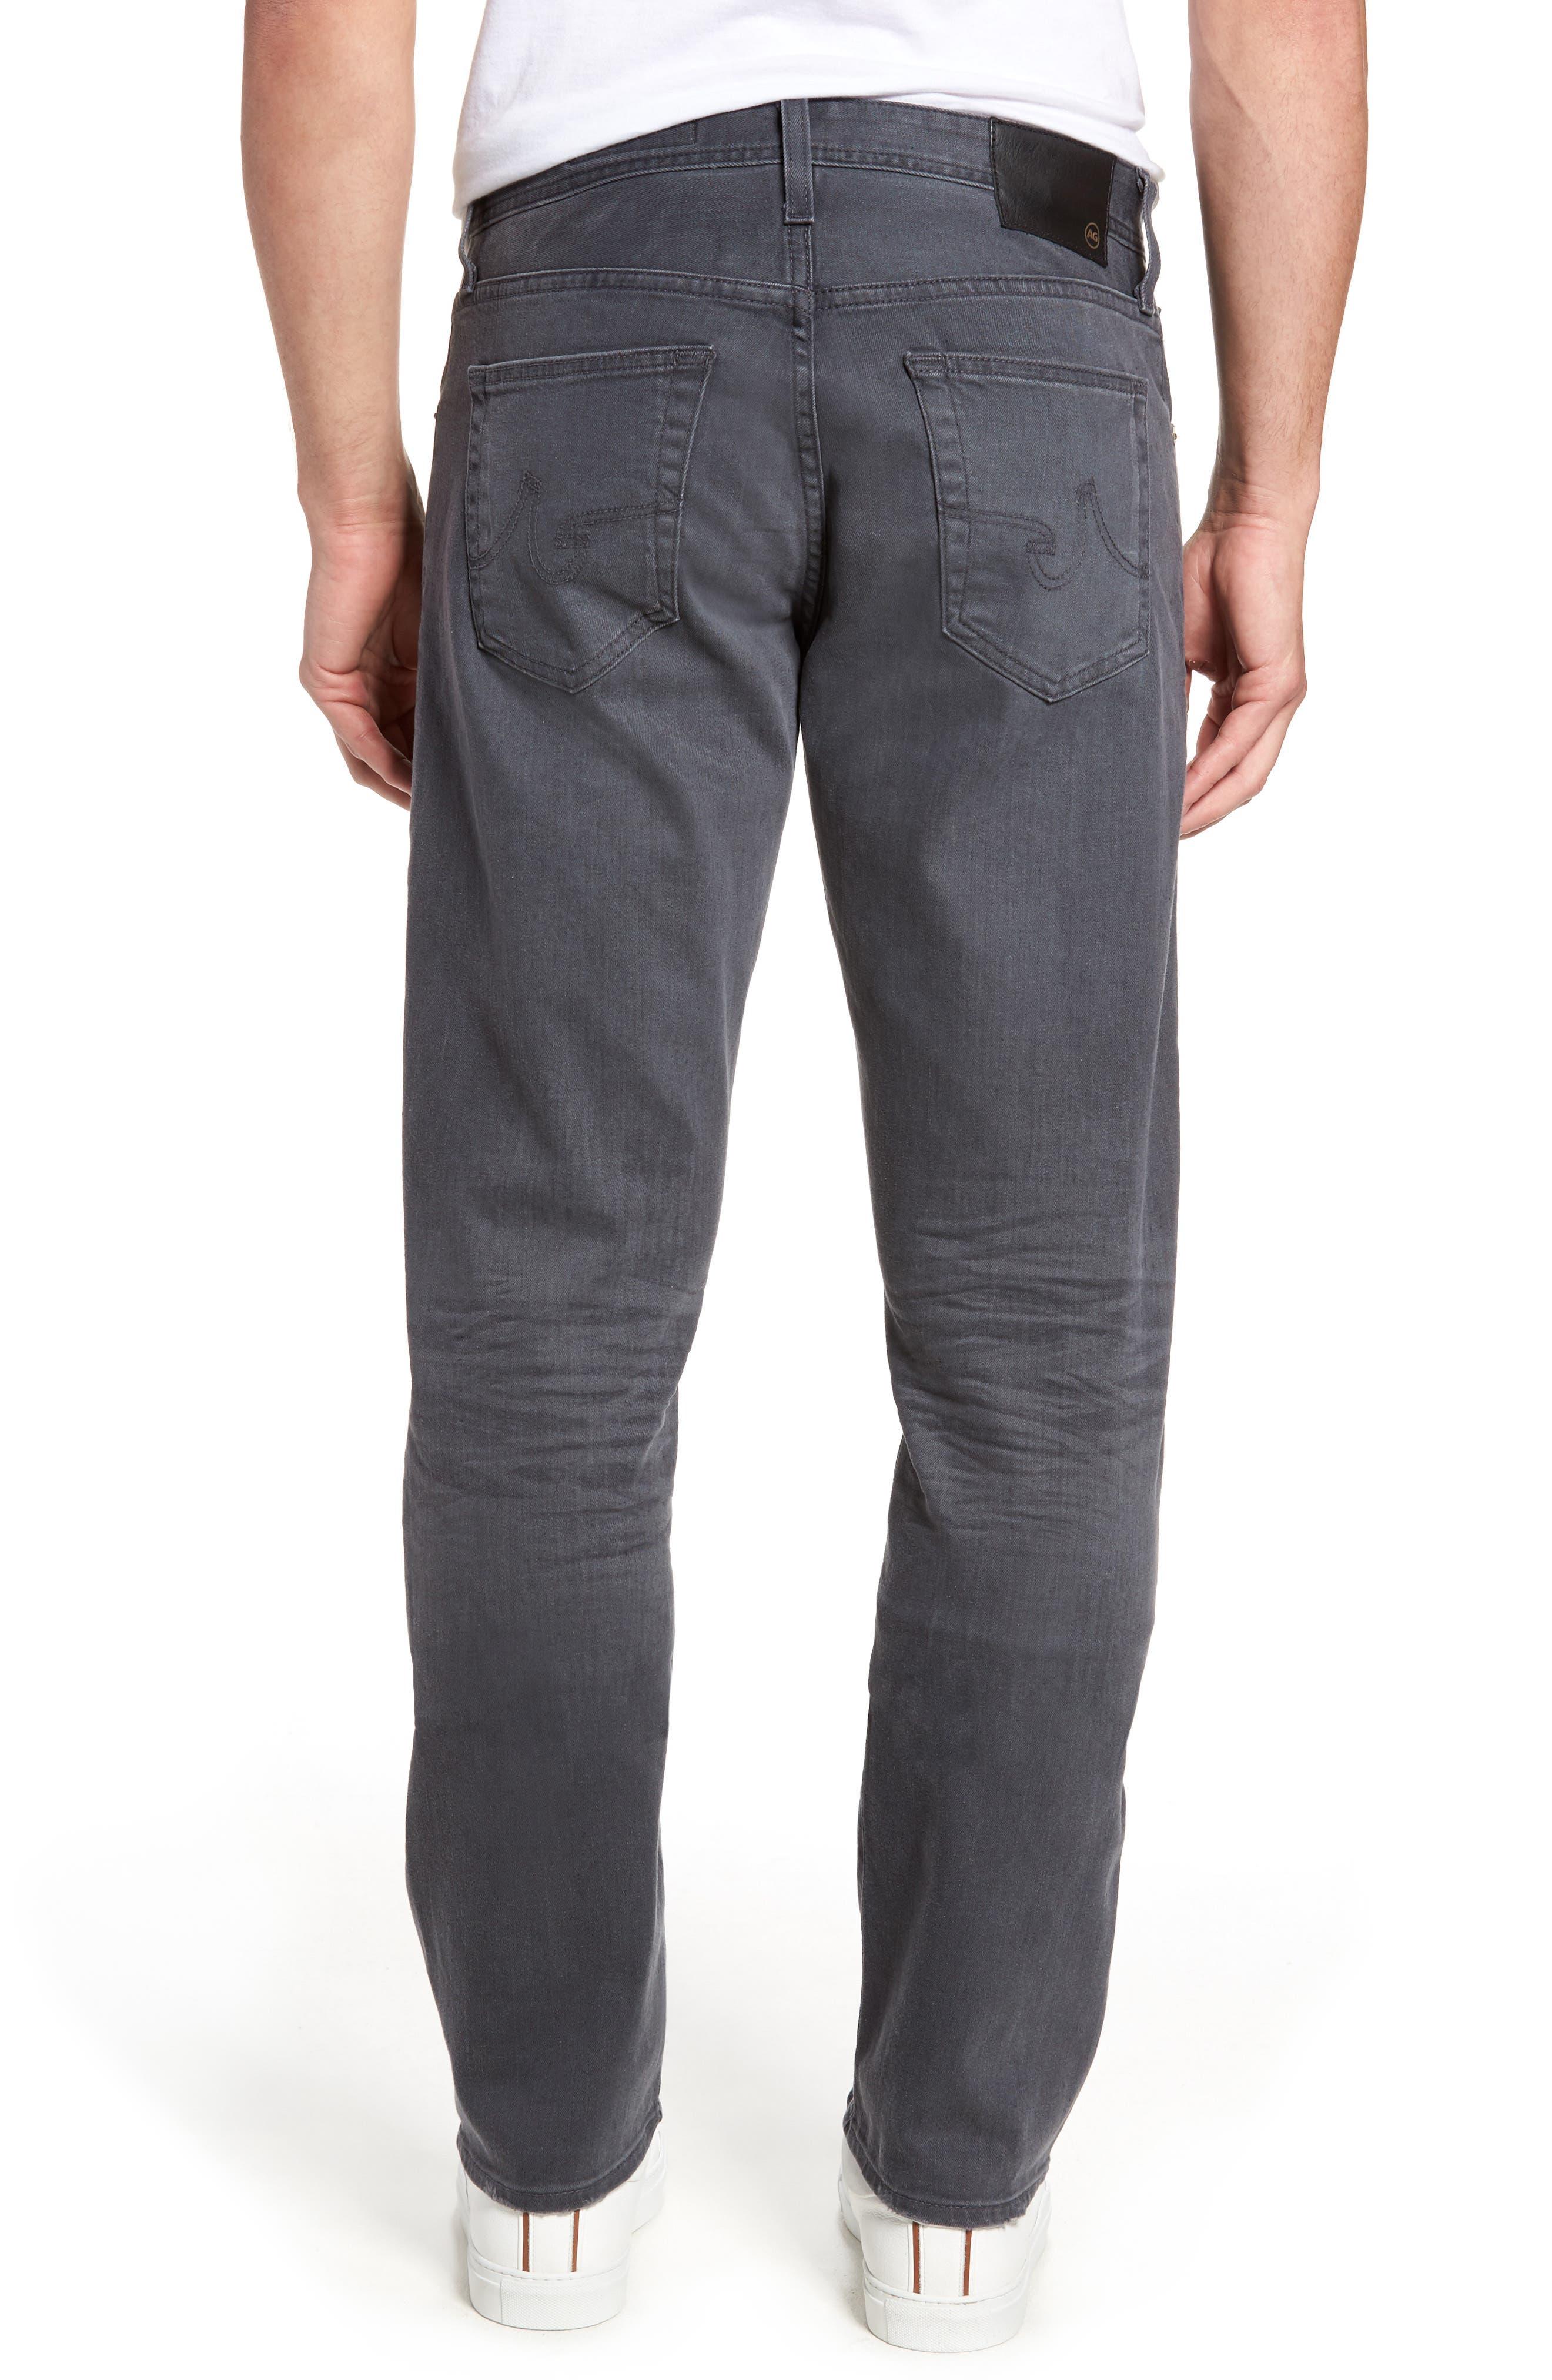 Ives Straight Leg Jeans,                             Alternate thumbnail 2, color,                             020